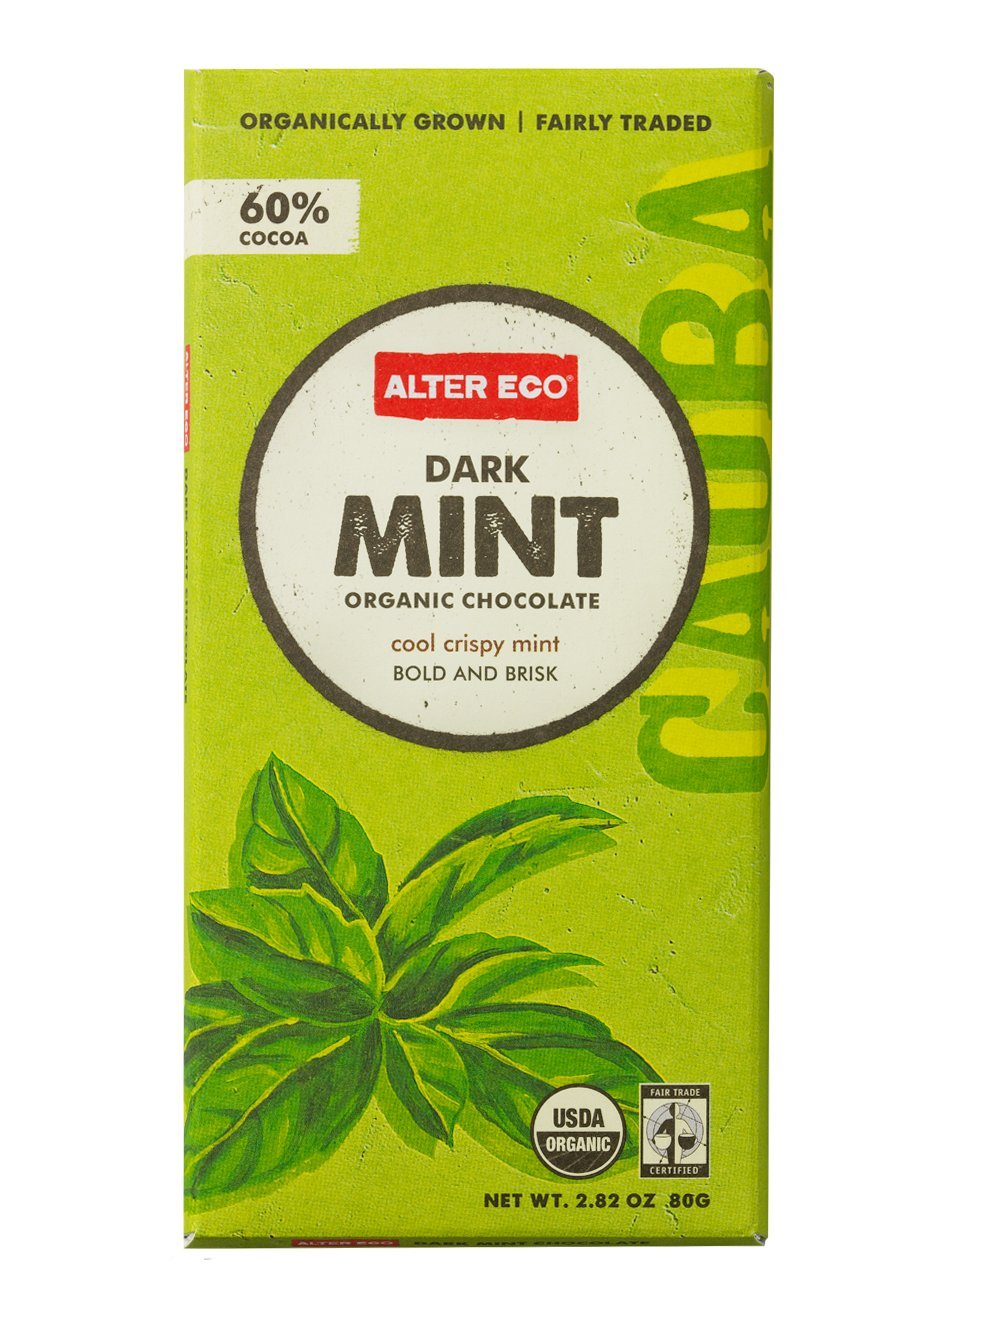 Amazon.com : Alter Eco - Dark Mint Organic Chocolate - 2.82 oz ...